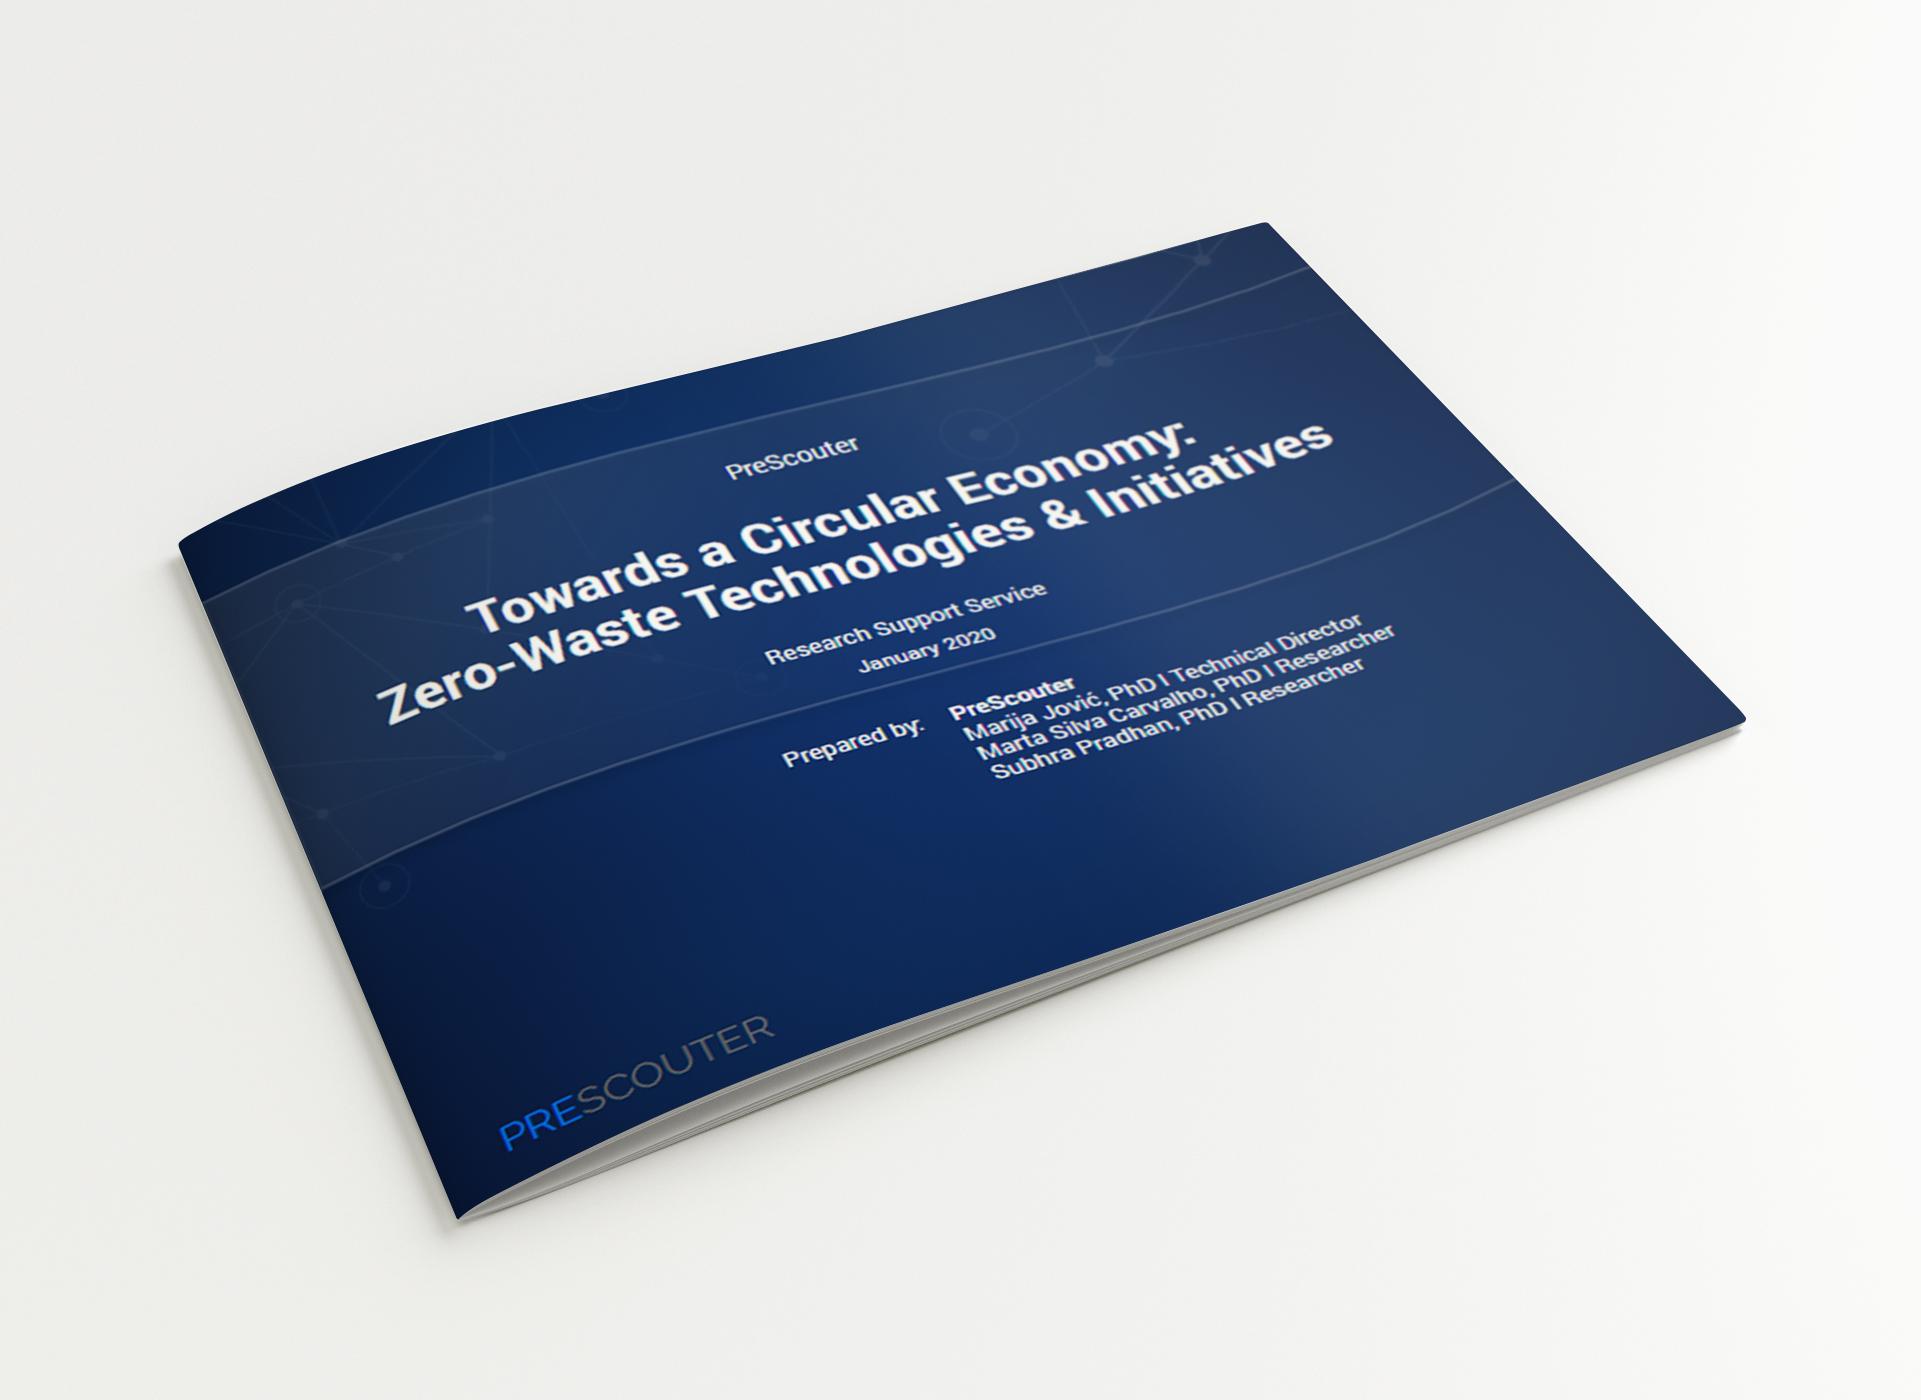 Towards a Circular Economy: Zero-Waste Technologies & Initiatives